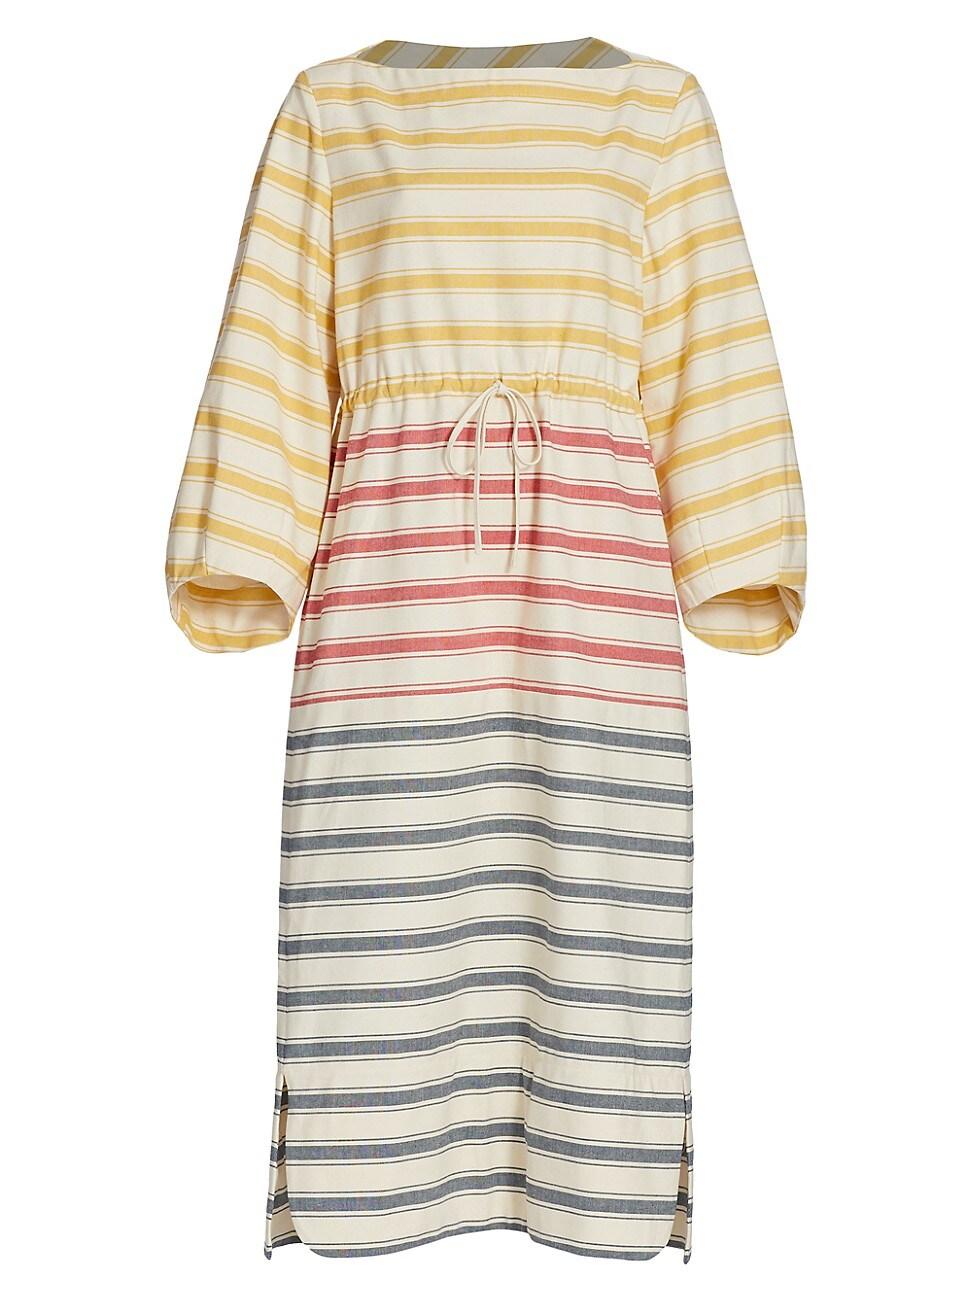 Rosie Assoulin Cottons WOMEN'S STRIPED DRAWSTRING CAFTAN DRESS